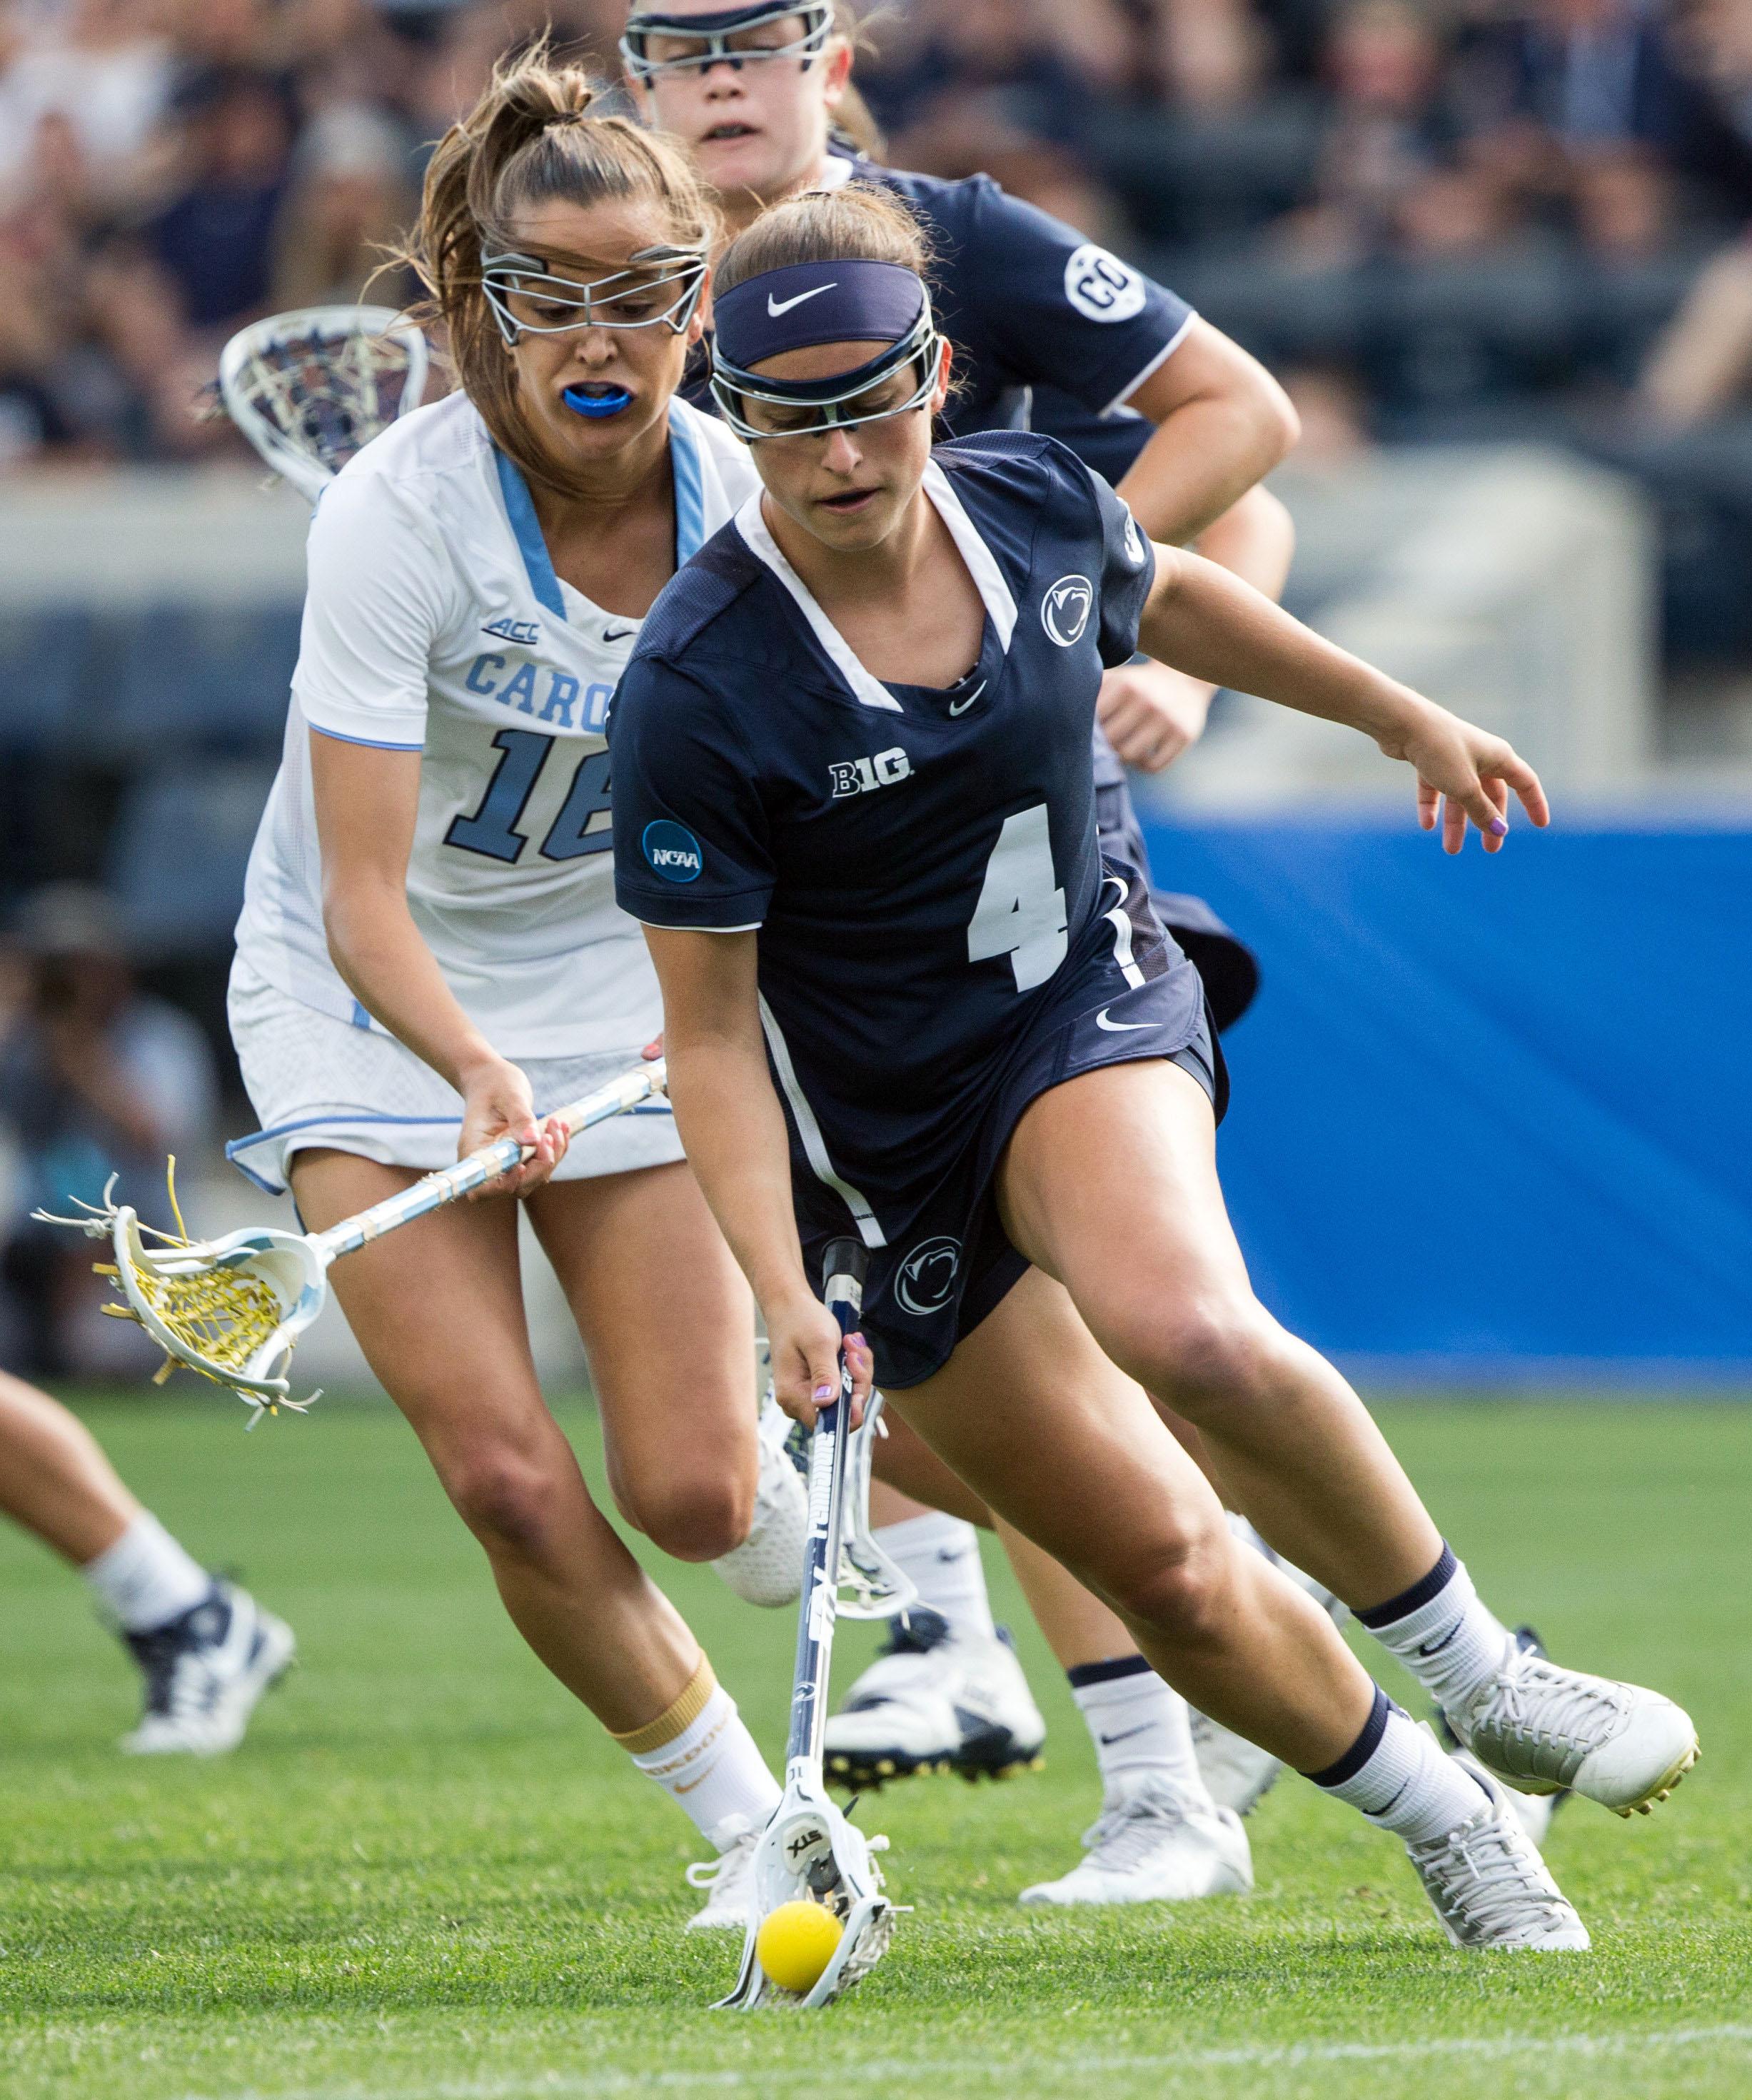 NCAA Lacrosse: Women's Semi Final-North Carolina vs Penn State